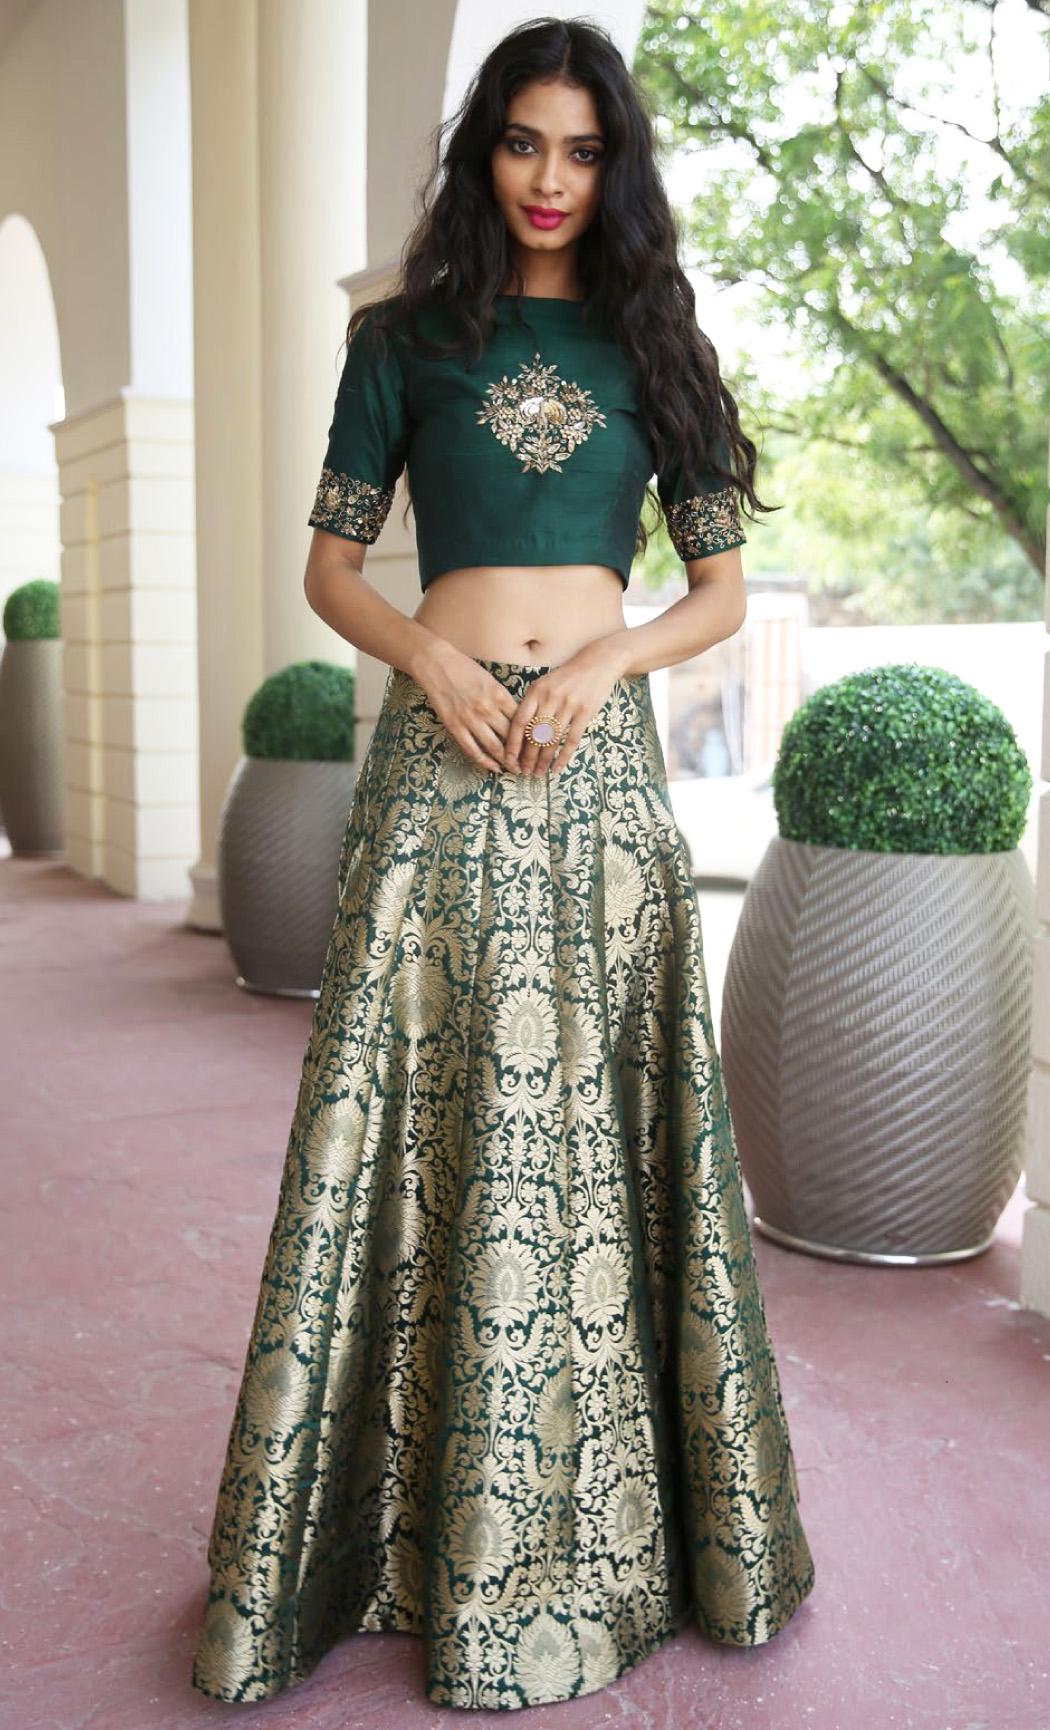 Deep Green Crop Top and a High Waisted Kalidar Lehenga Skirt